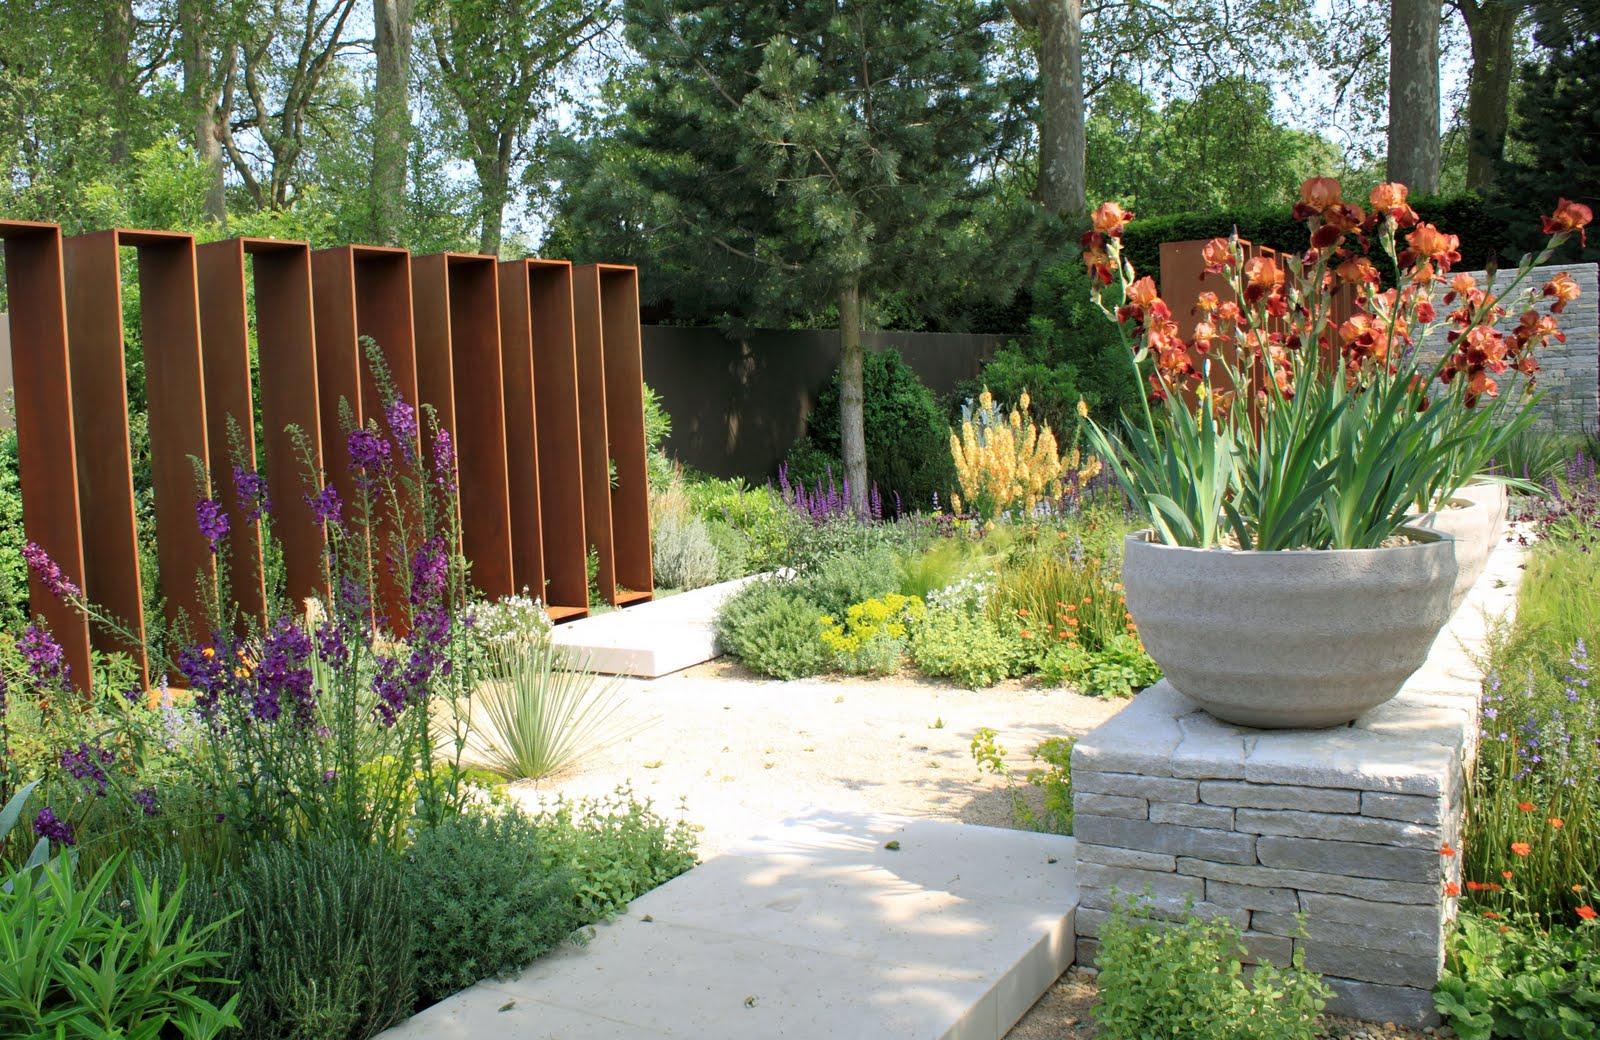 1000 images about landscape design on pinterest for Jamie durie garden designs